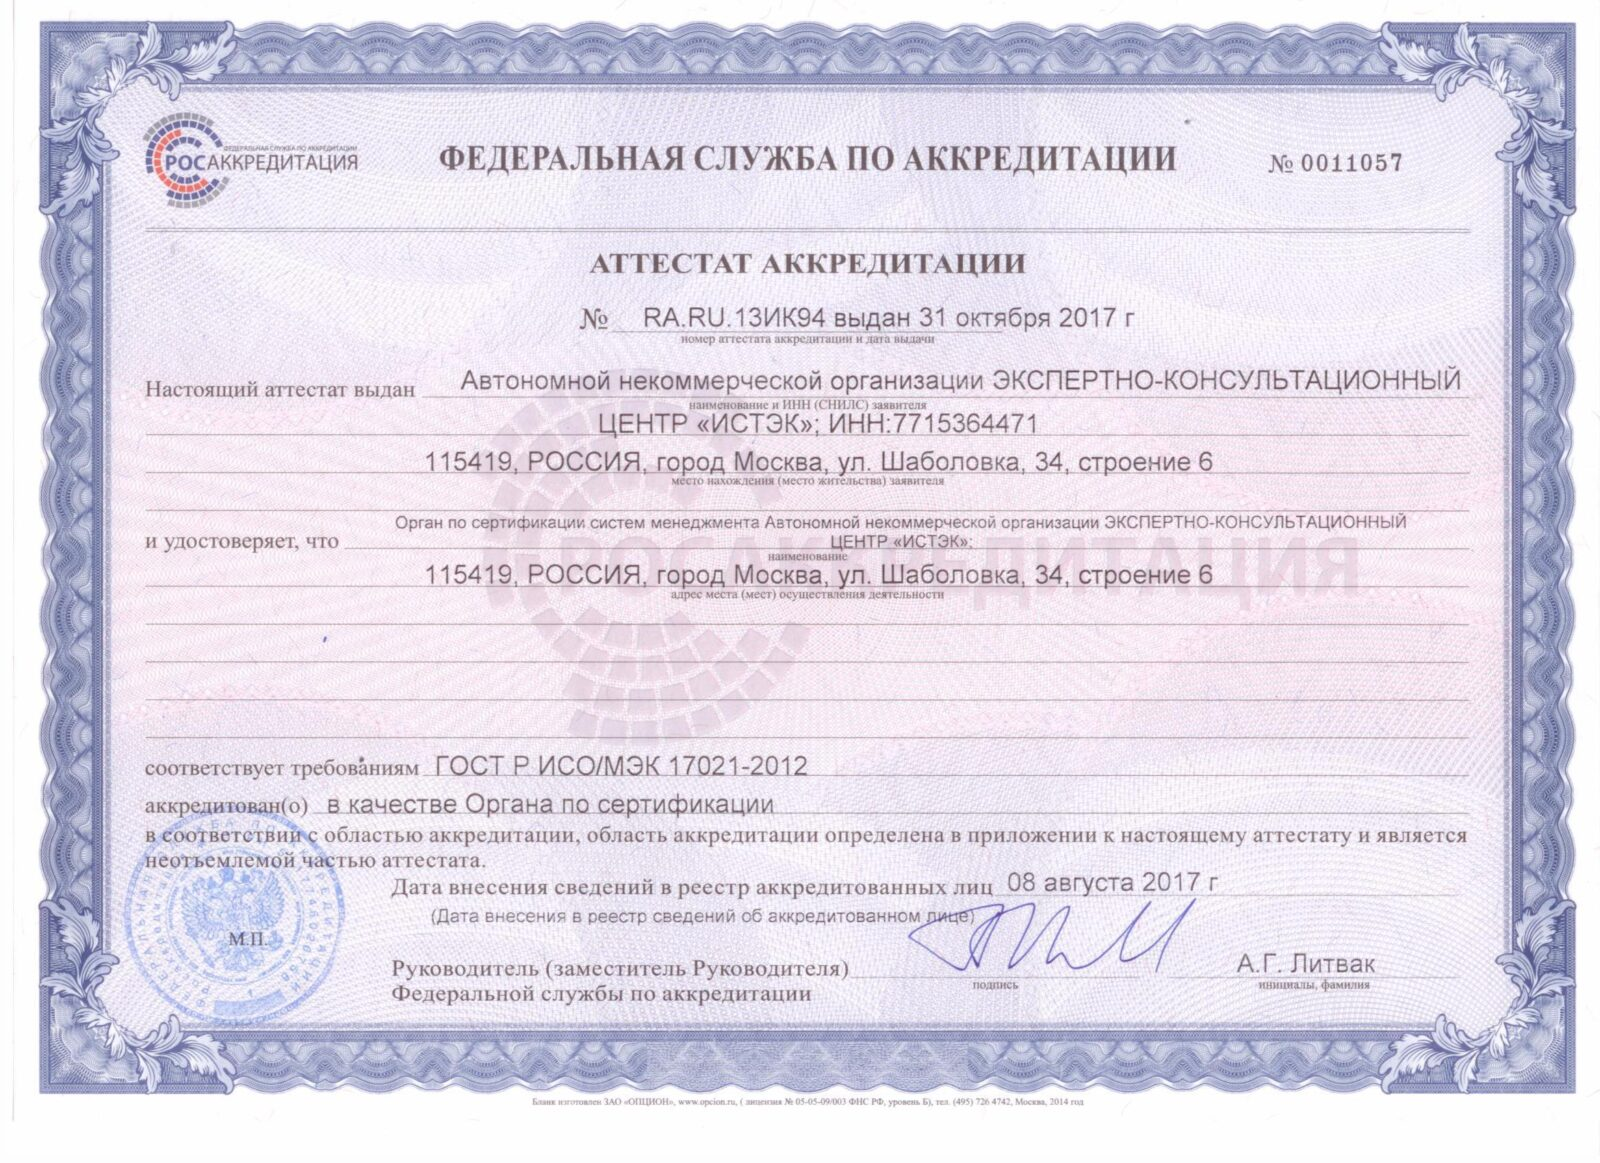 Аттестат аккредитации в качестве органа сертификации 2017 АНО ЭКЦ